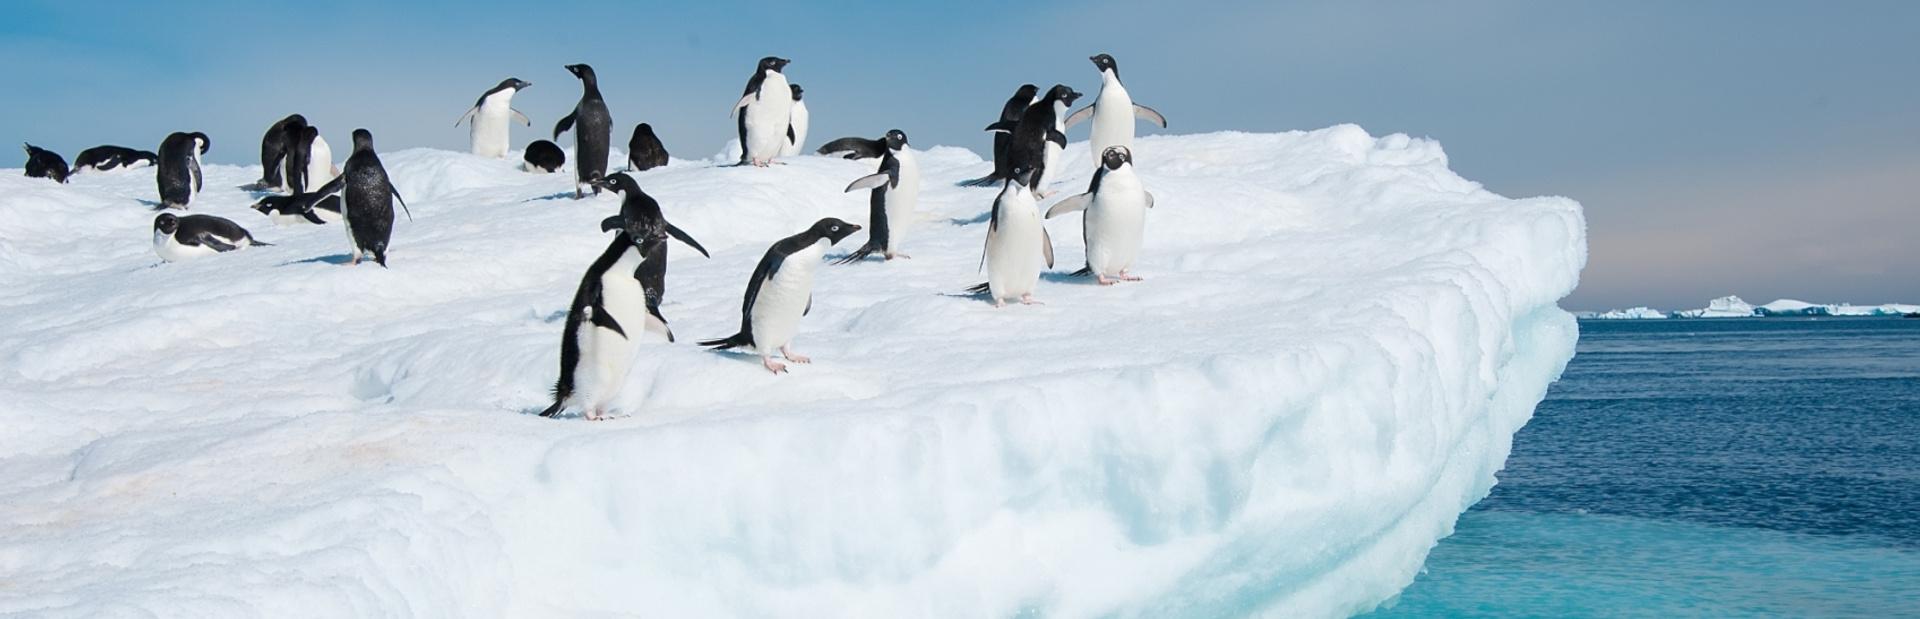 Antarctica news photo